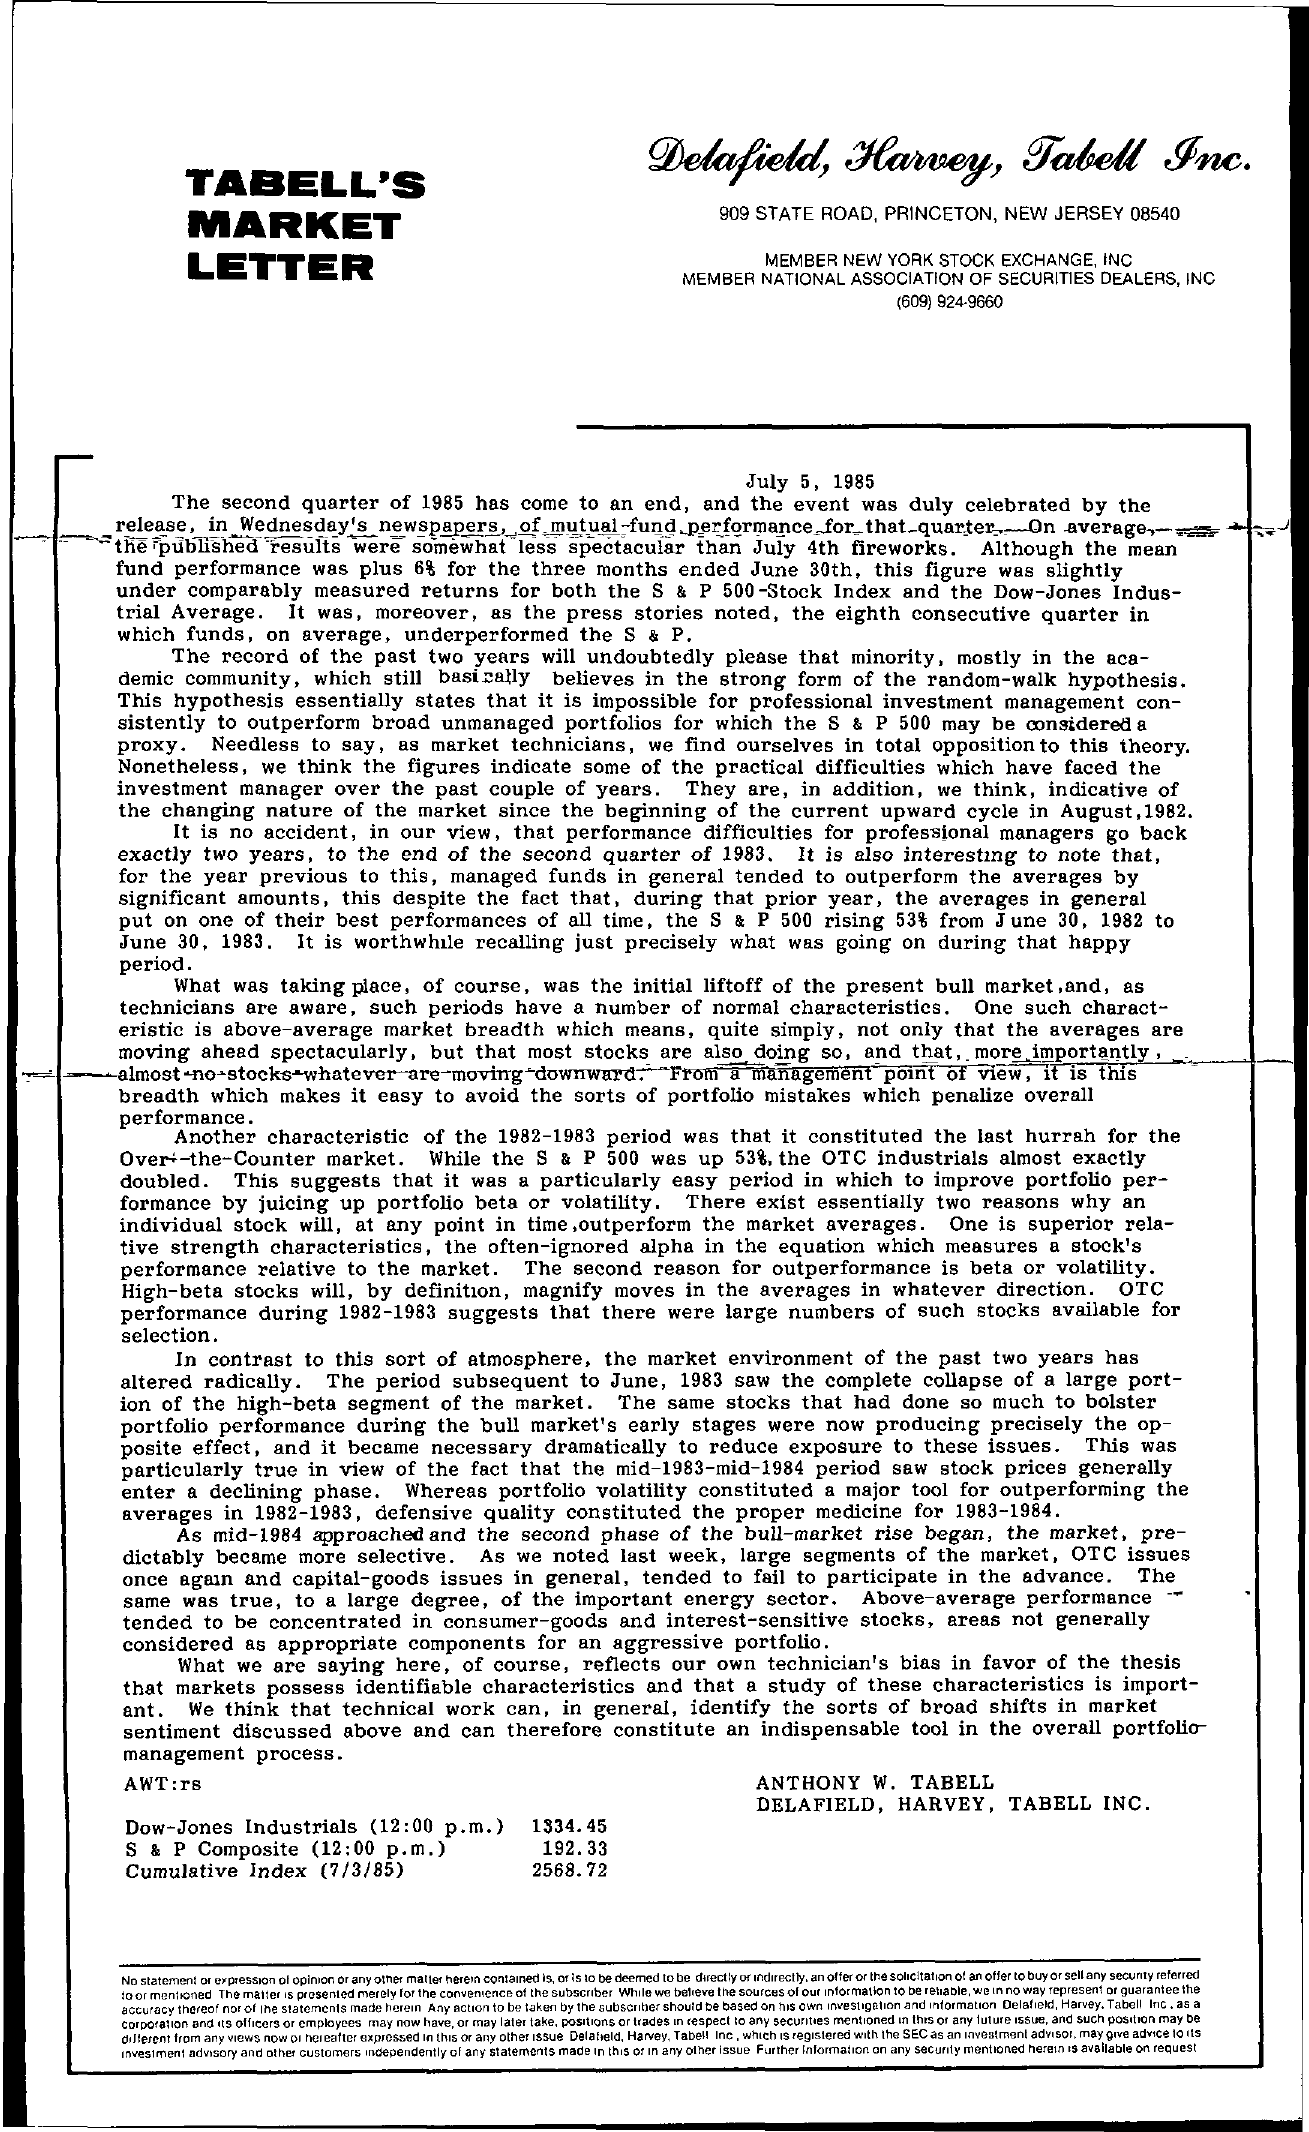 Tabell's Market Letter - July 05, 1985